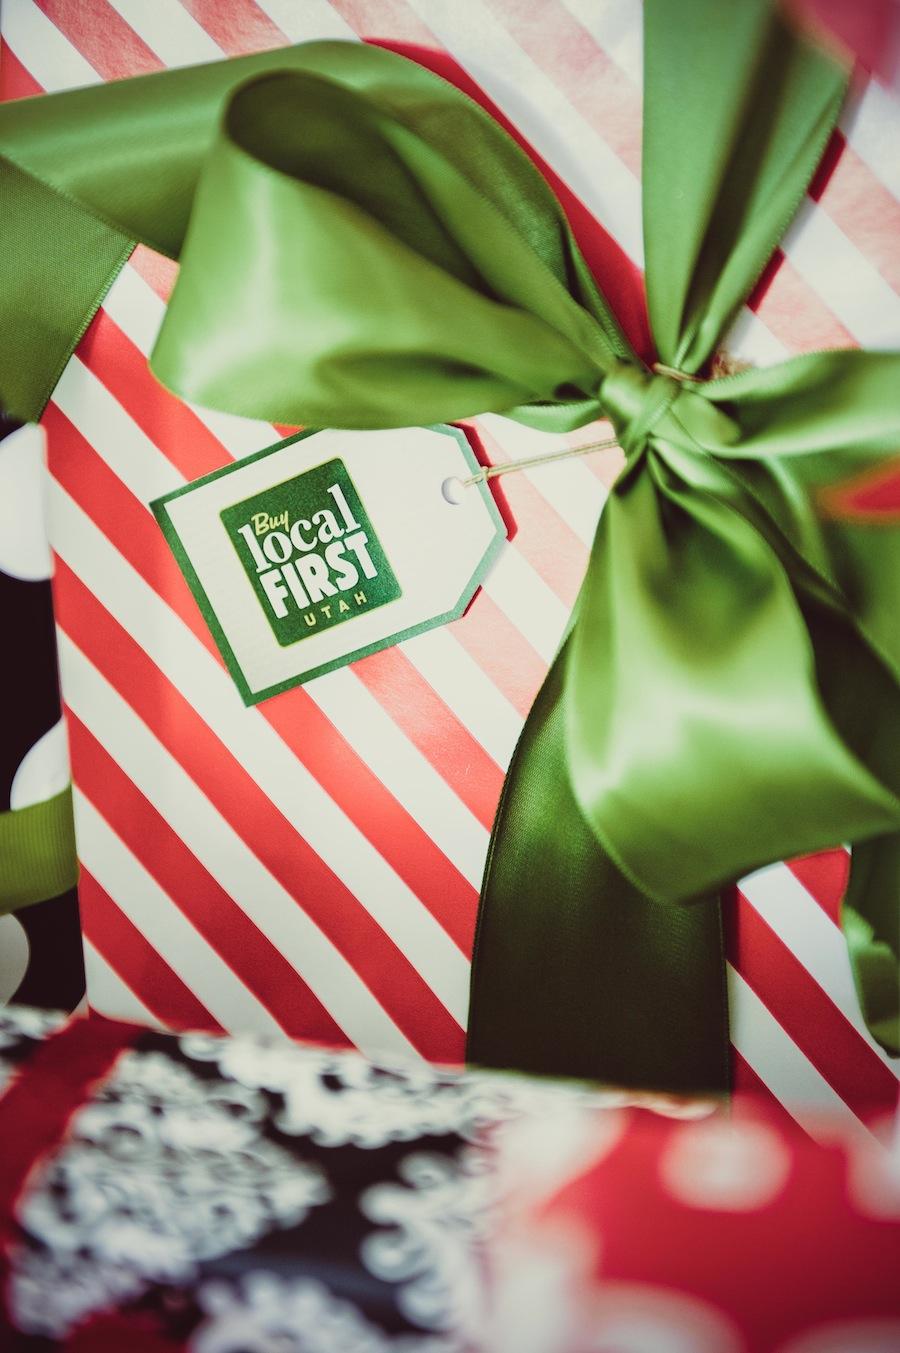 Buy-Local-Utah-First-Holiday-Shopping-2